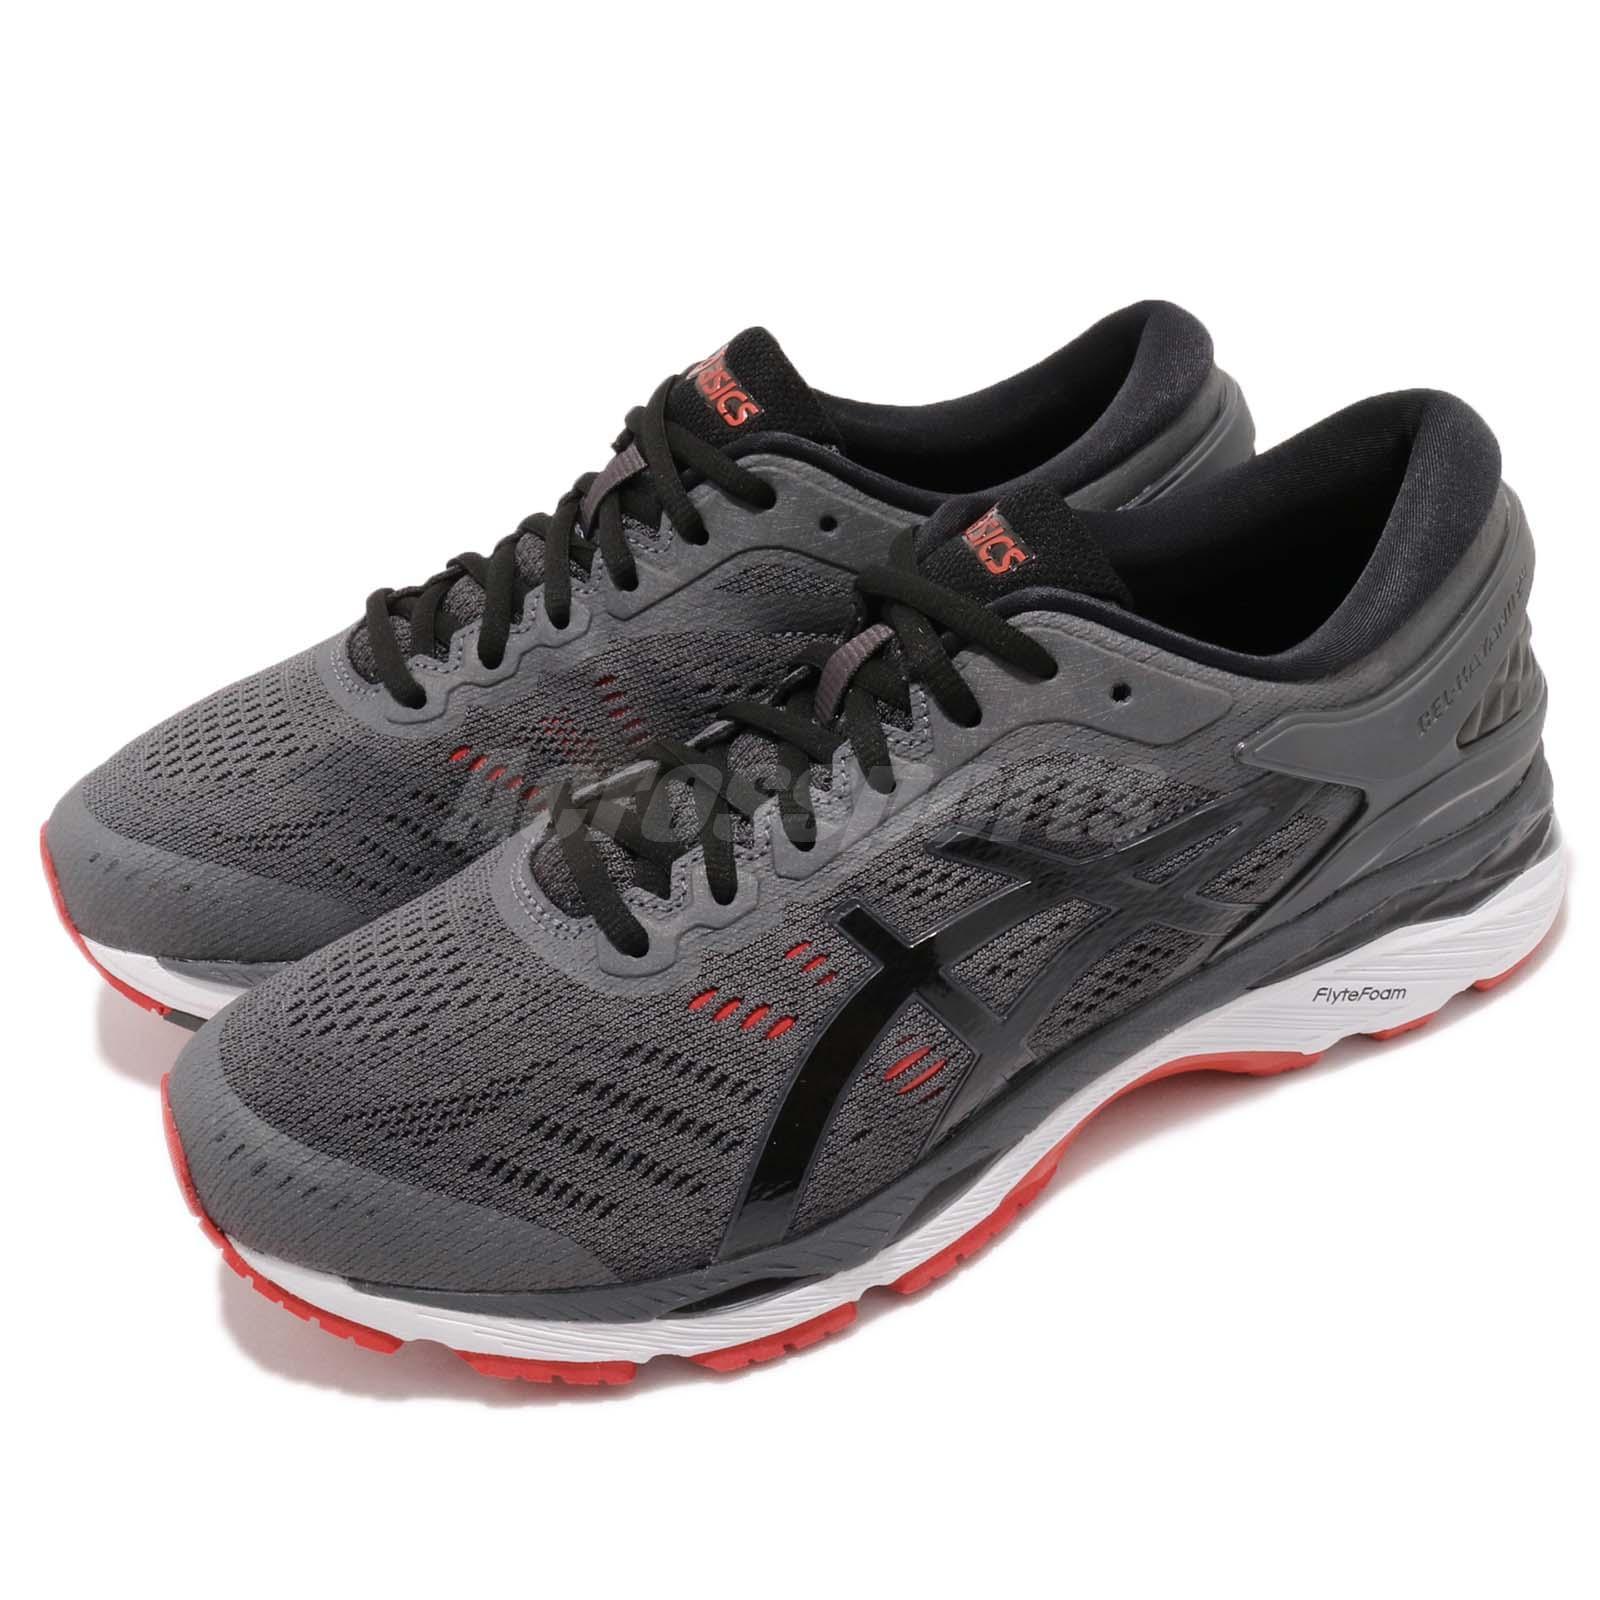 bester Preis populäres Design USA billig verkaufen Details about Asics Gel-Kayano 24 4E Extra Wide Grey Black Red Mens Running  Shoes T7A1N-9590